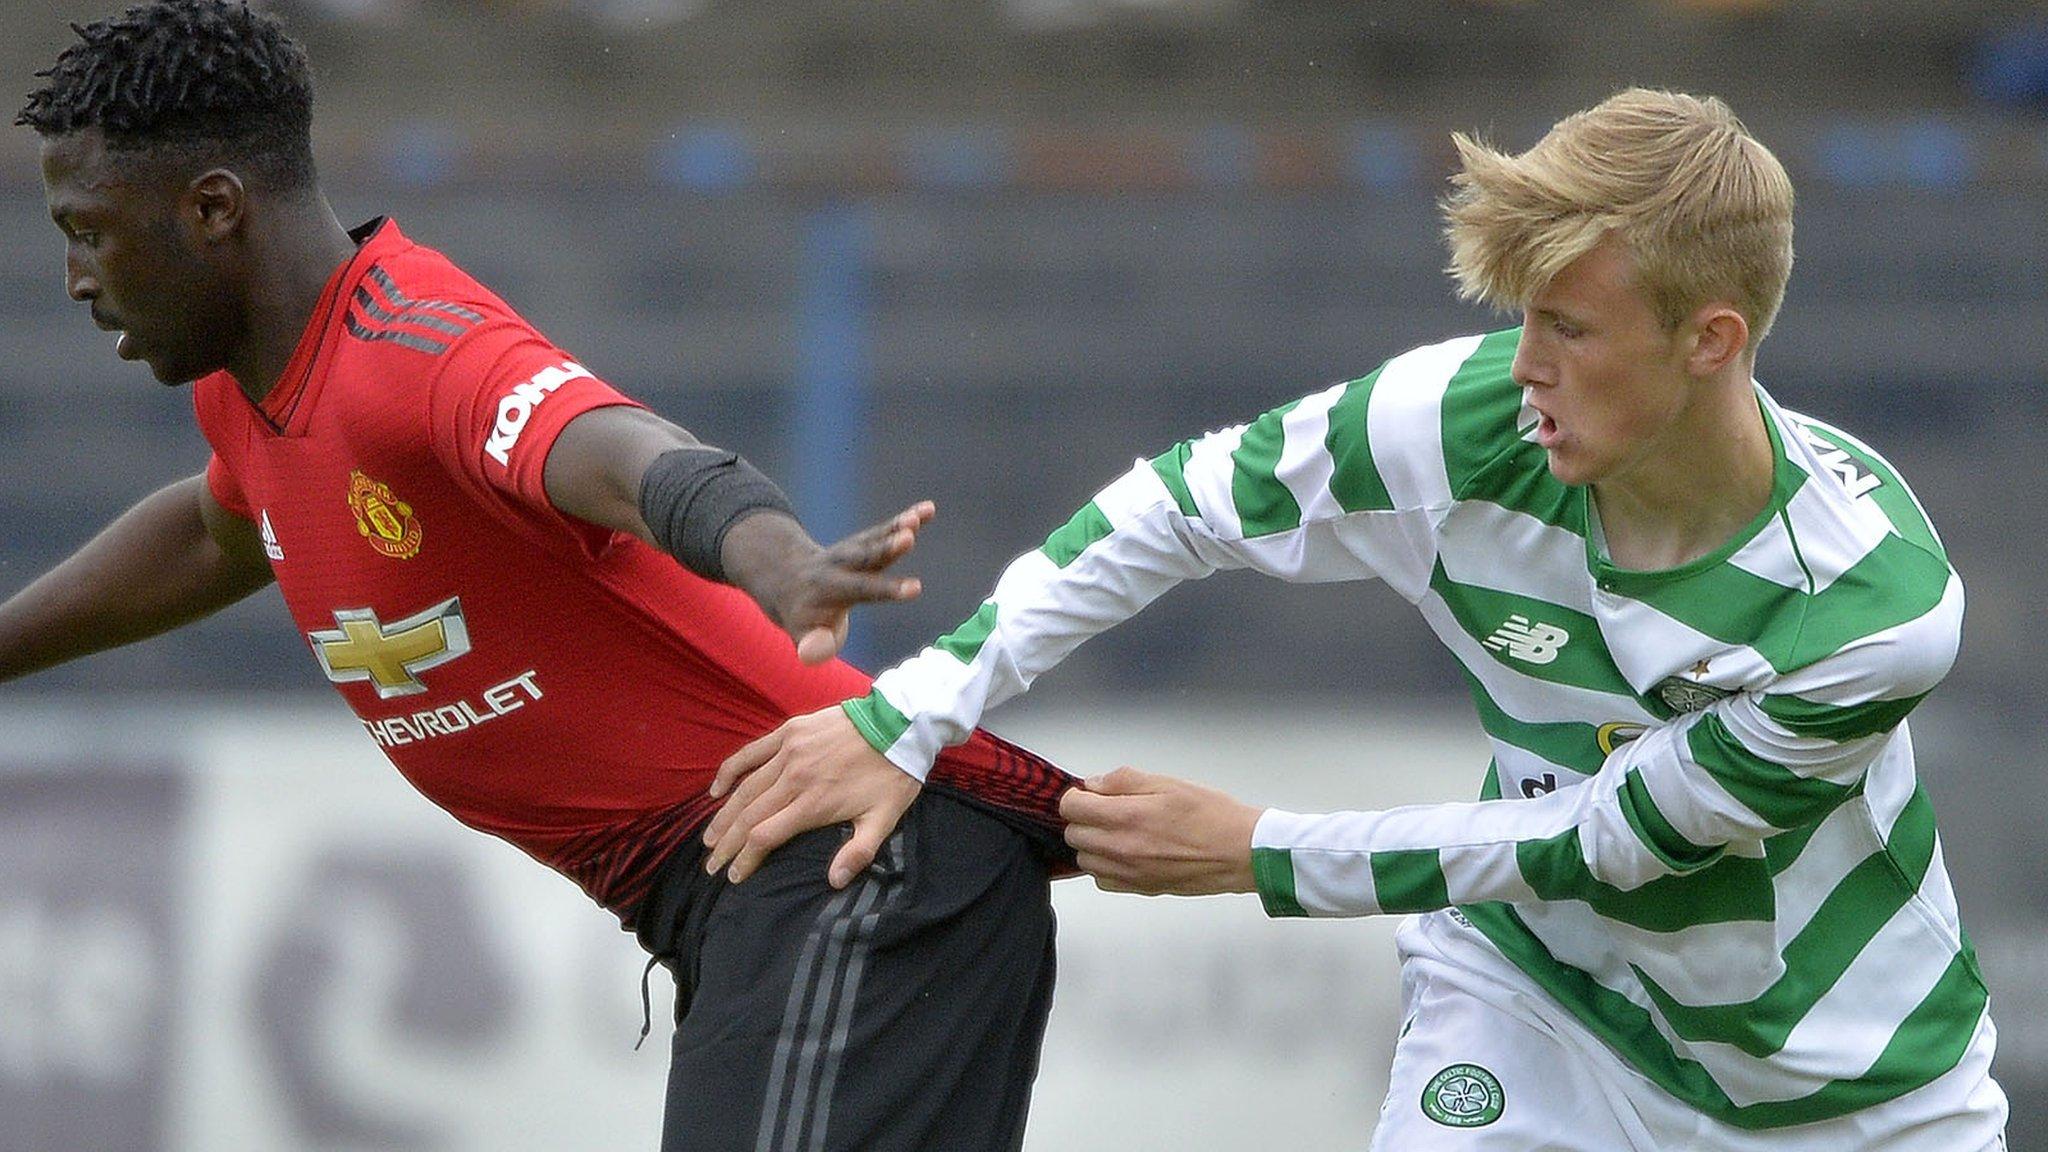 Celtic U19s come back to beat Man Utd